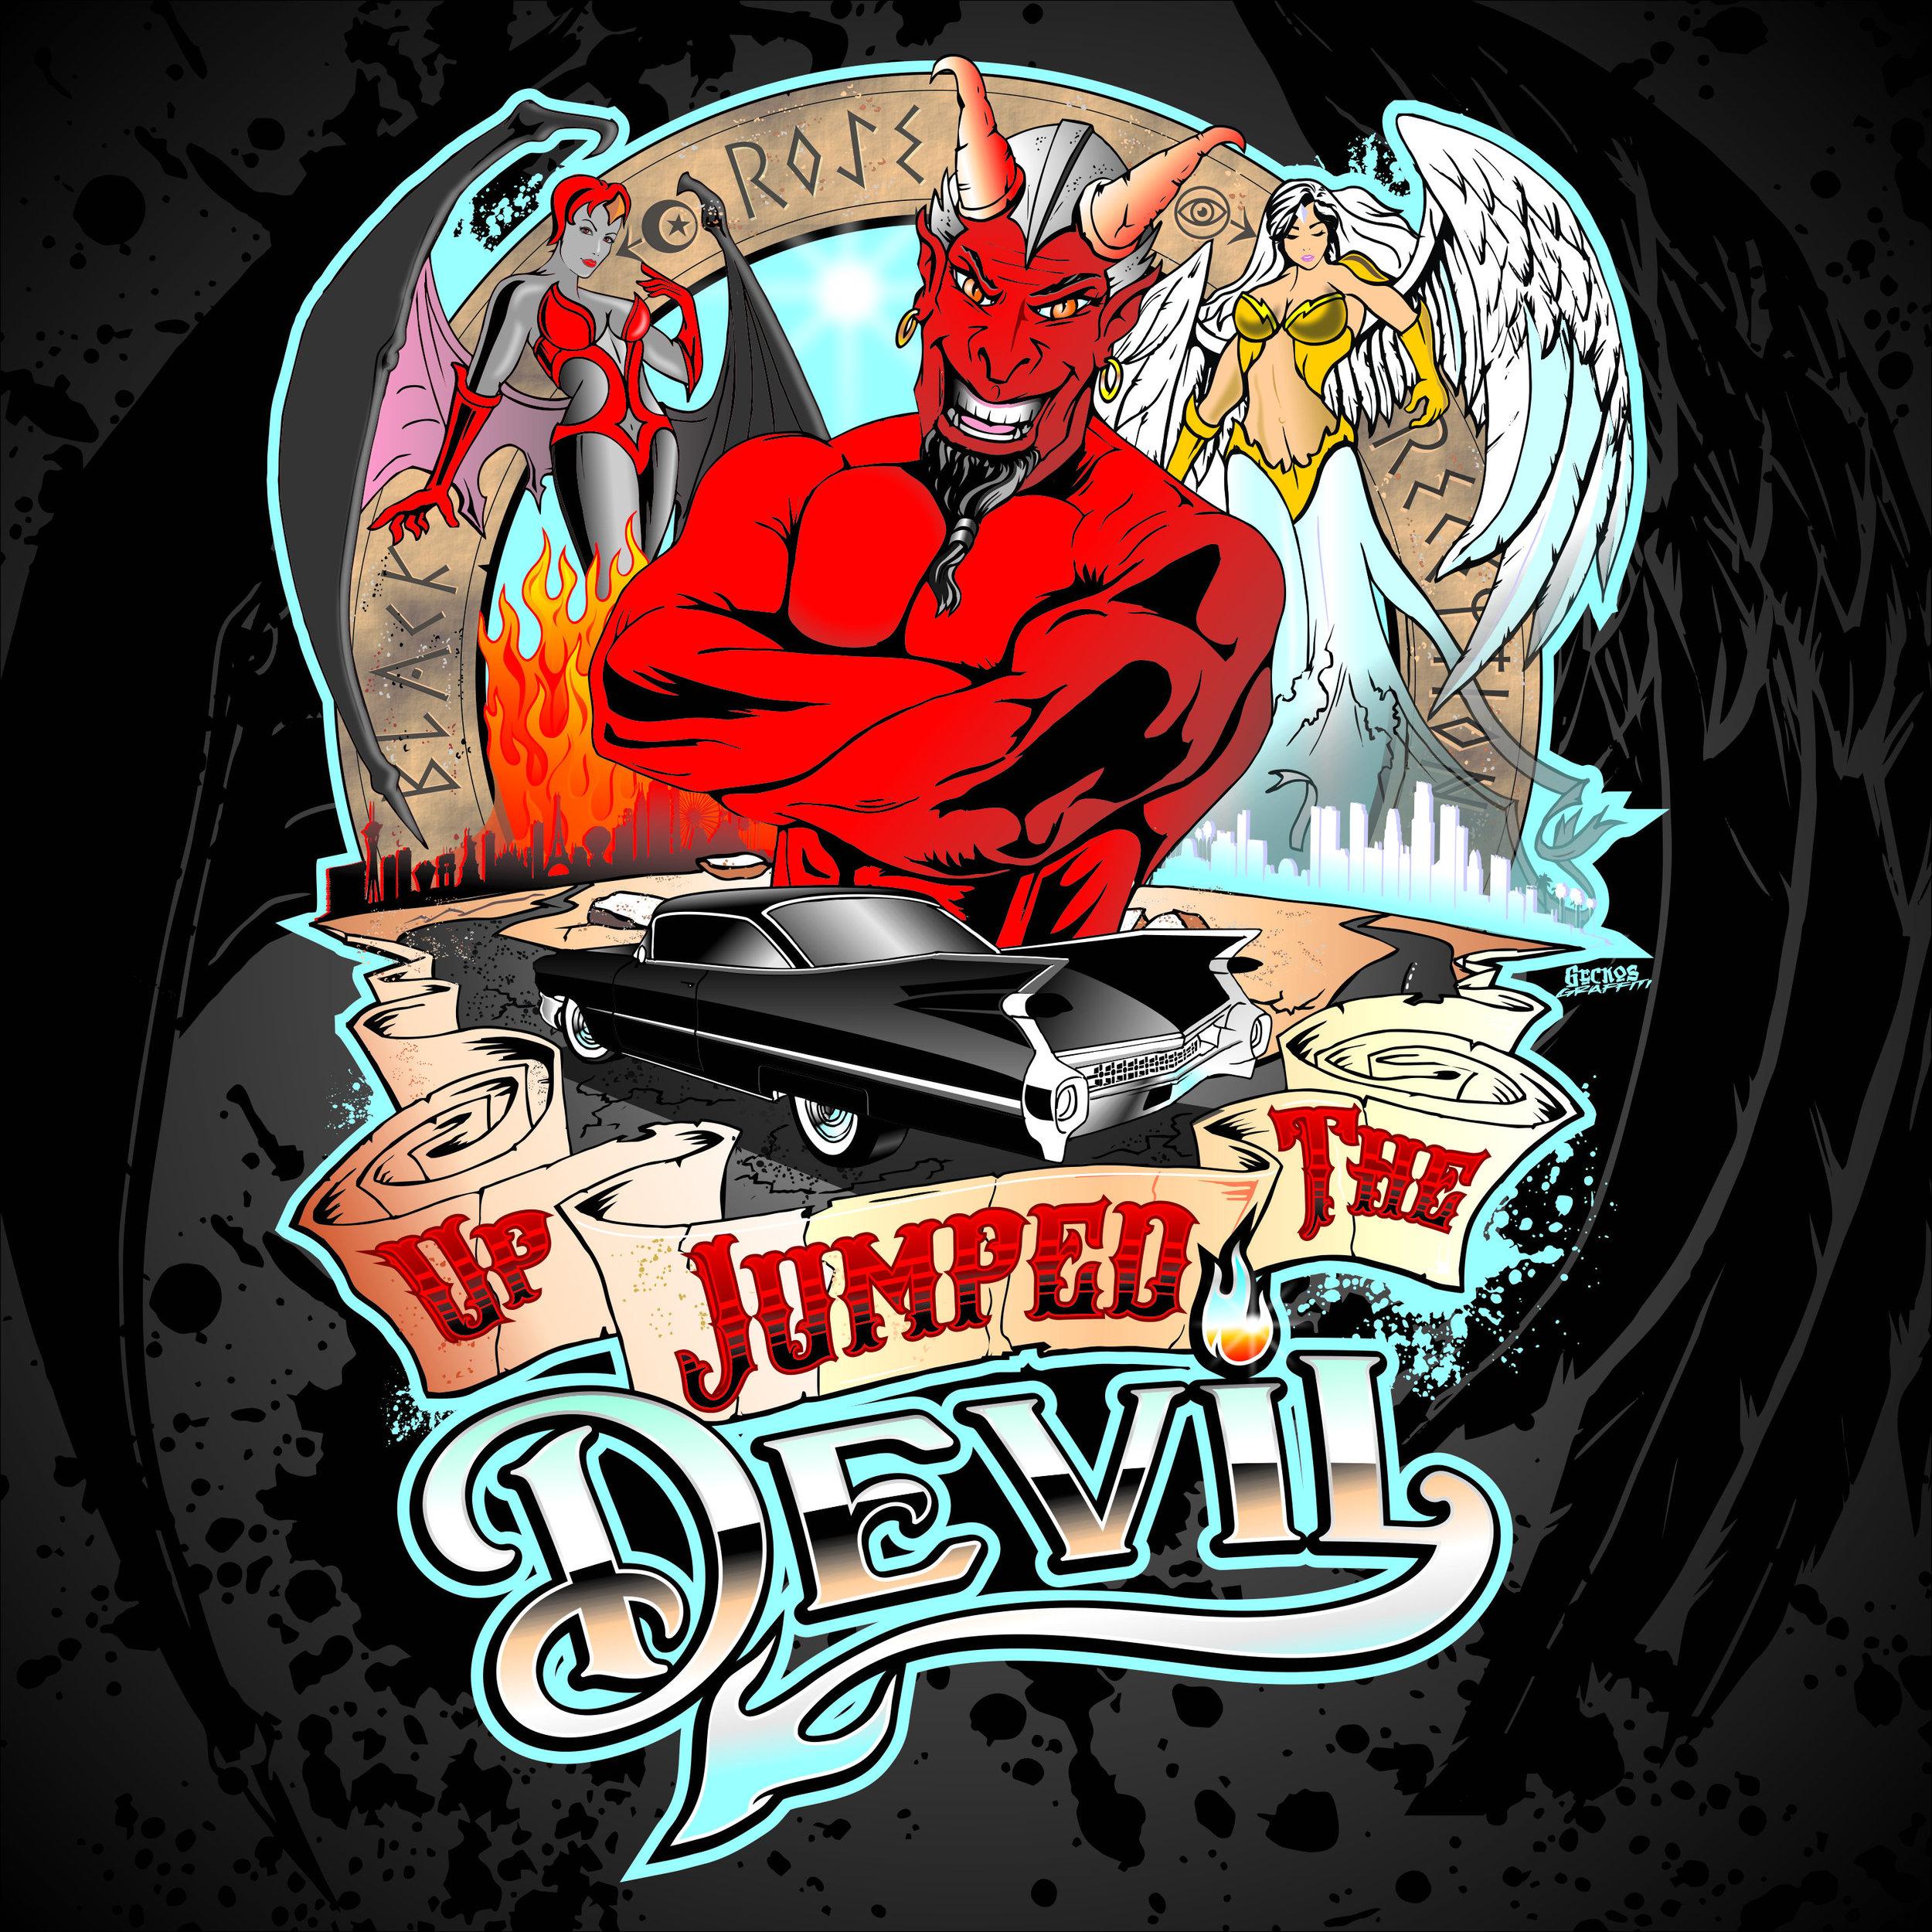 Black Rose Reception up jumped the devil logo.jpg